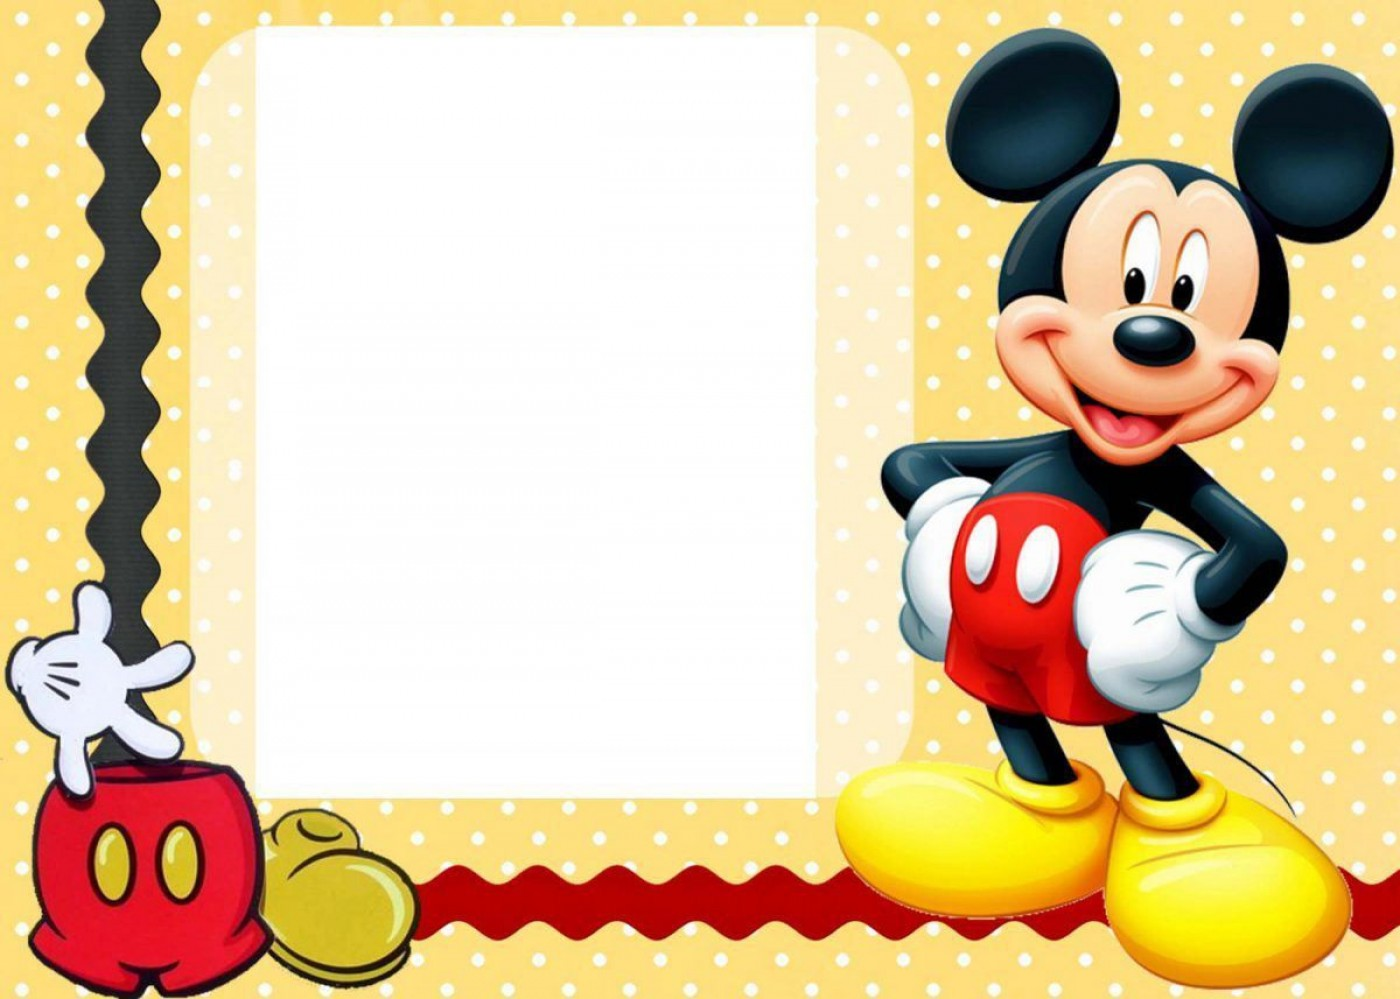 002 Stupendou Free Online Birthday Invitation Card Maker With Photo Inspiration  1st1400